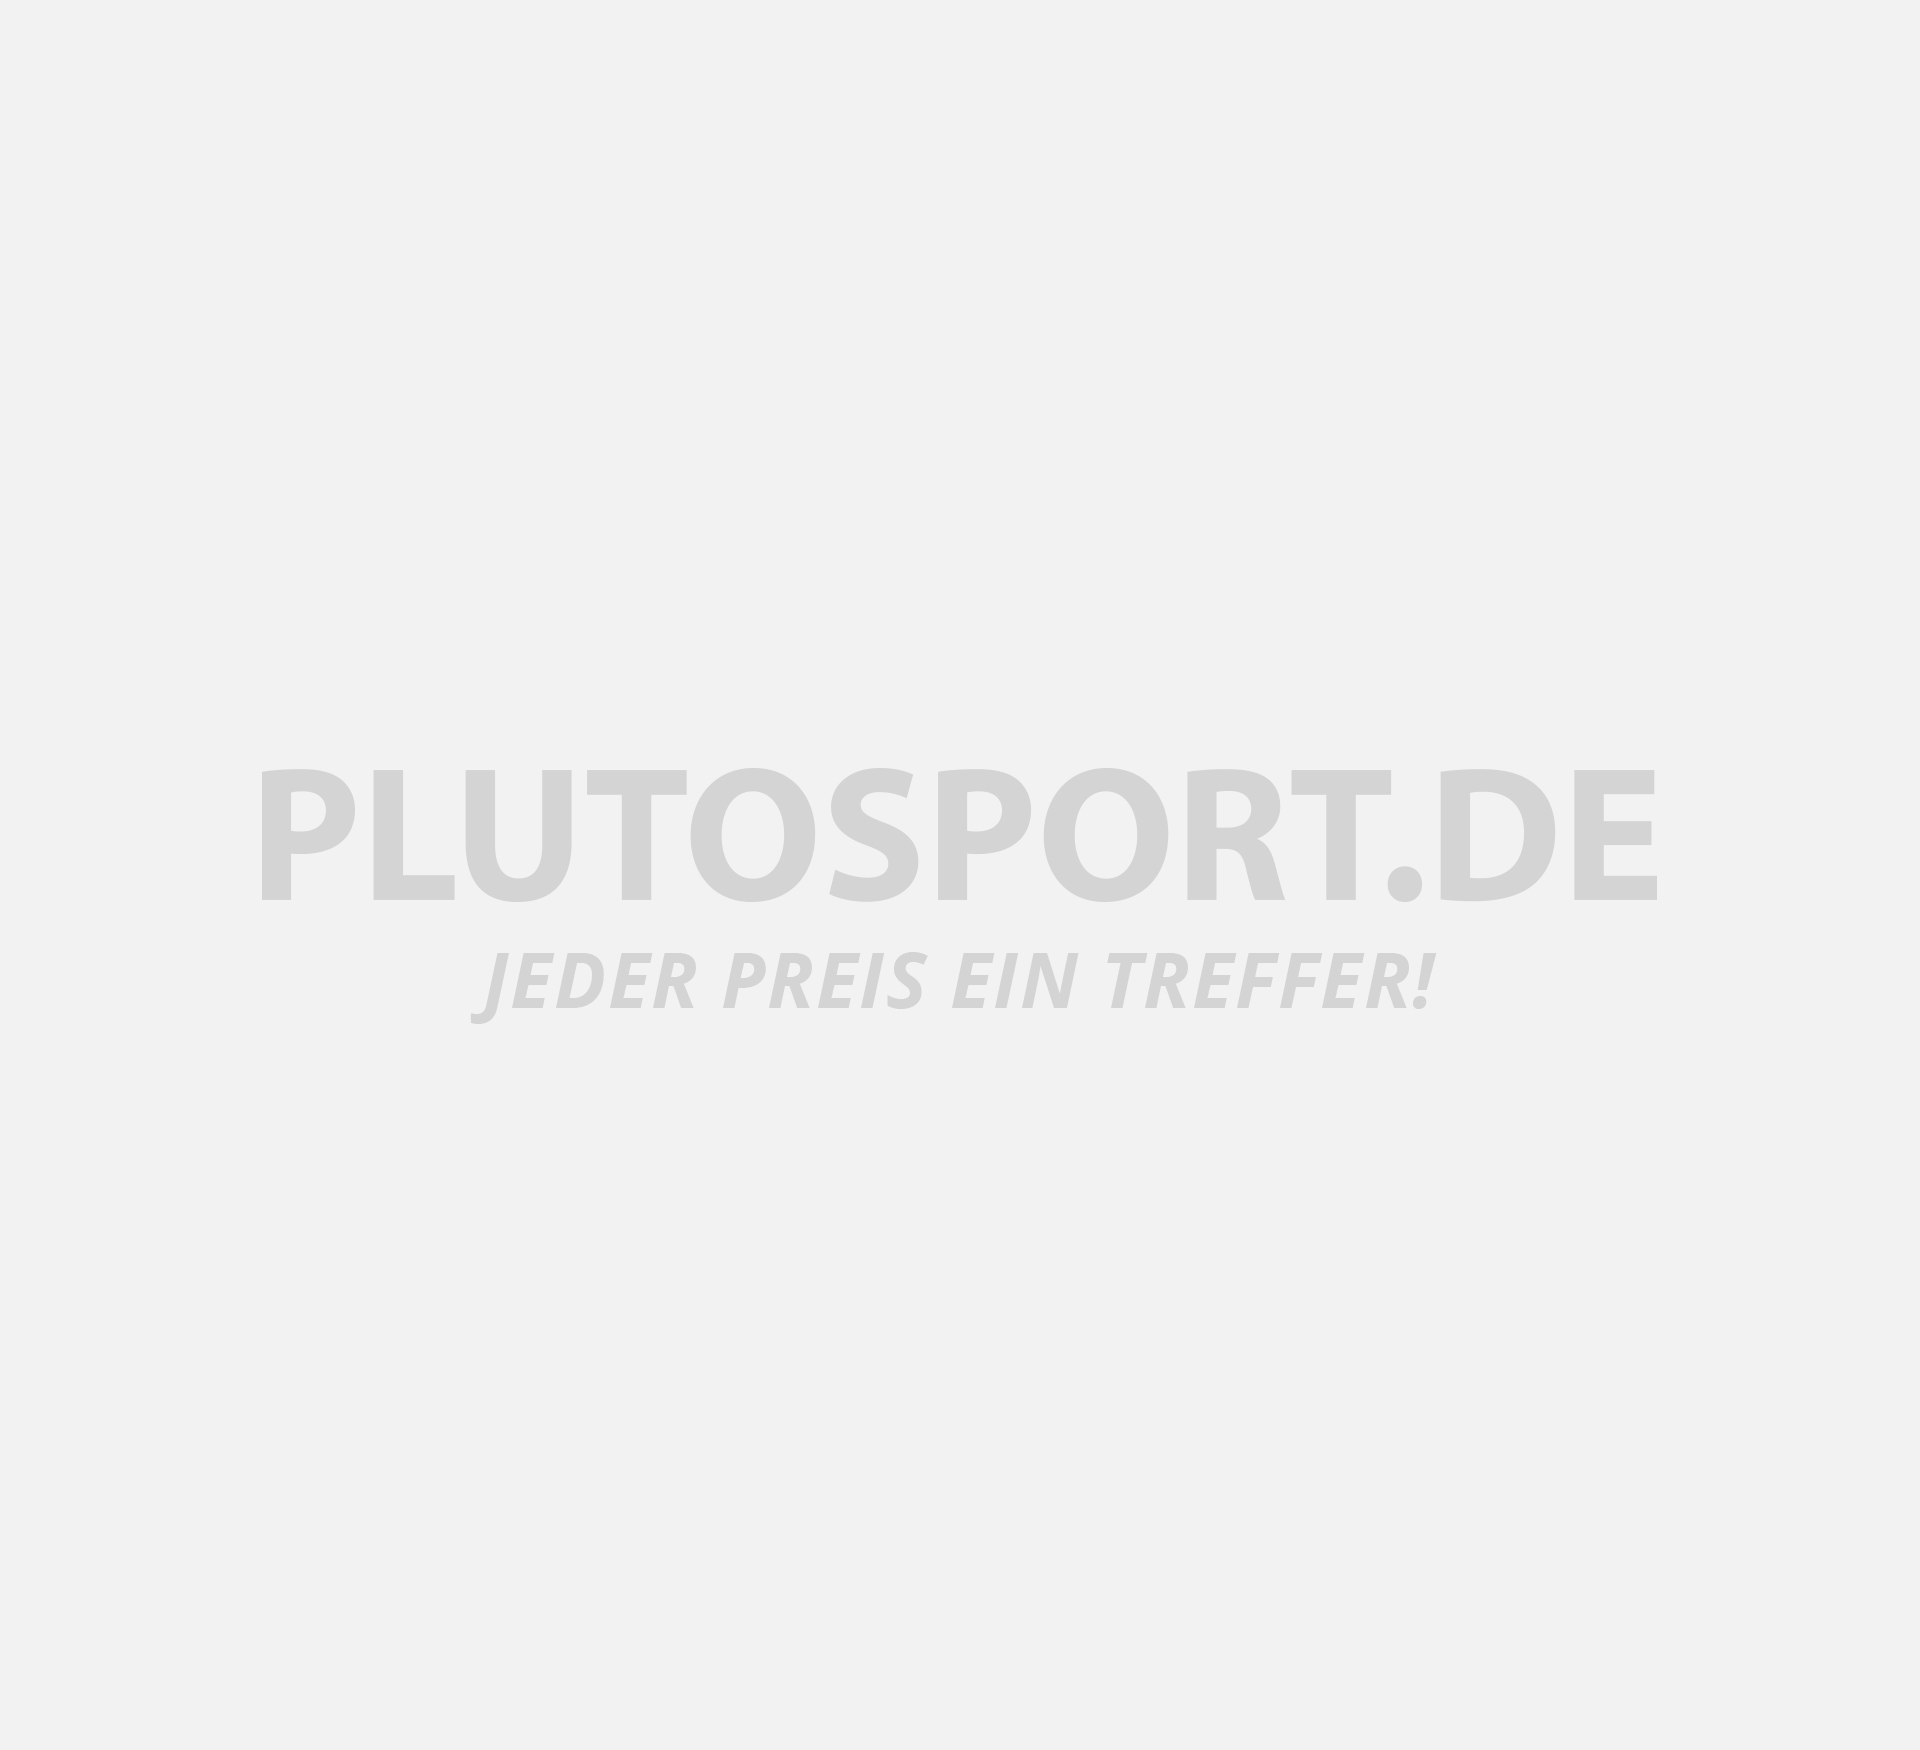 Adidas Uniforia League J290 Fußball EK 2020 Kinder